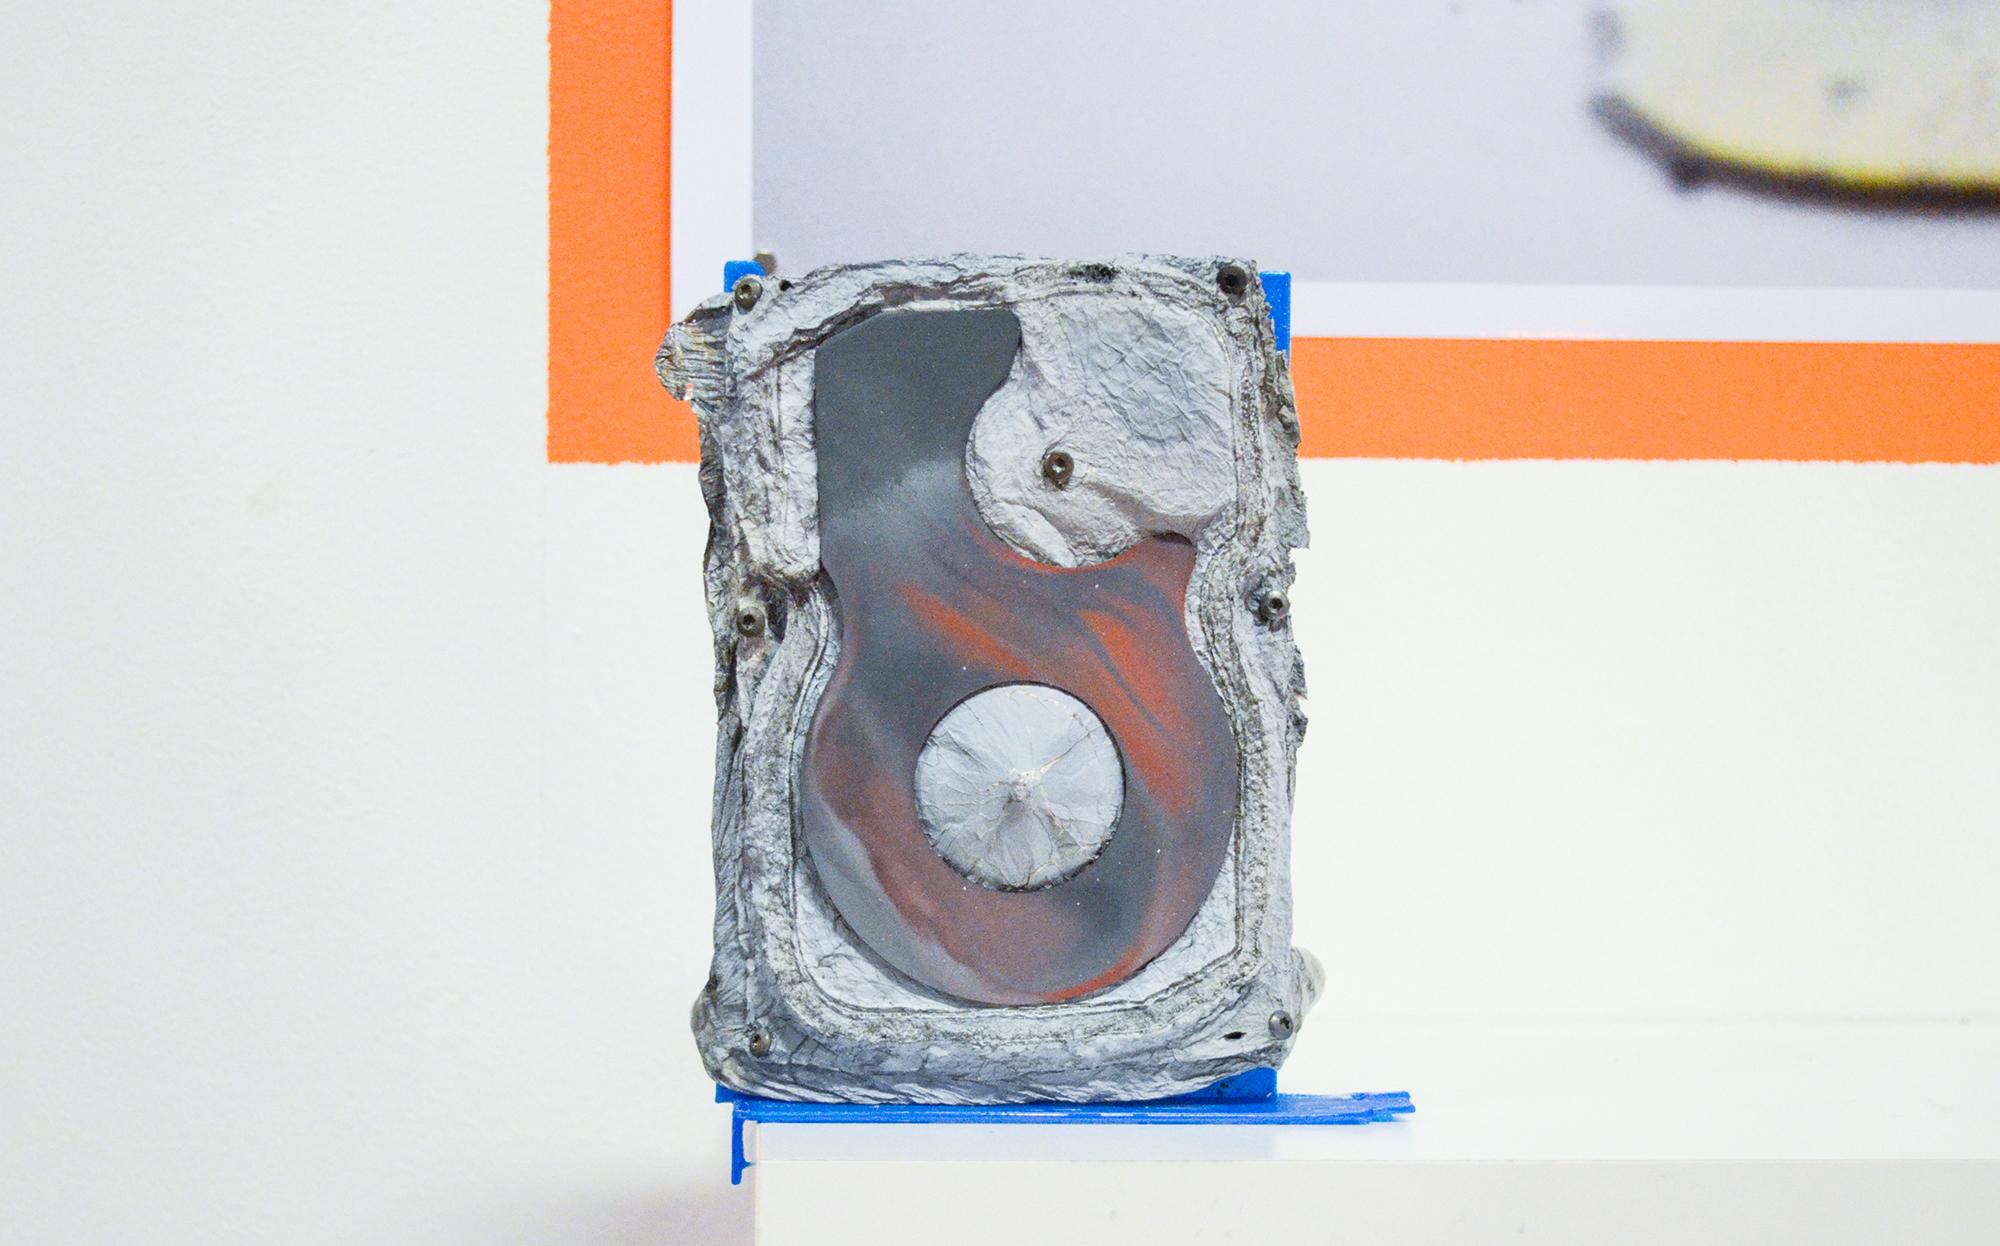 harddrive-burn.jpg